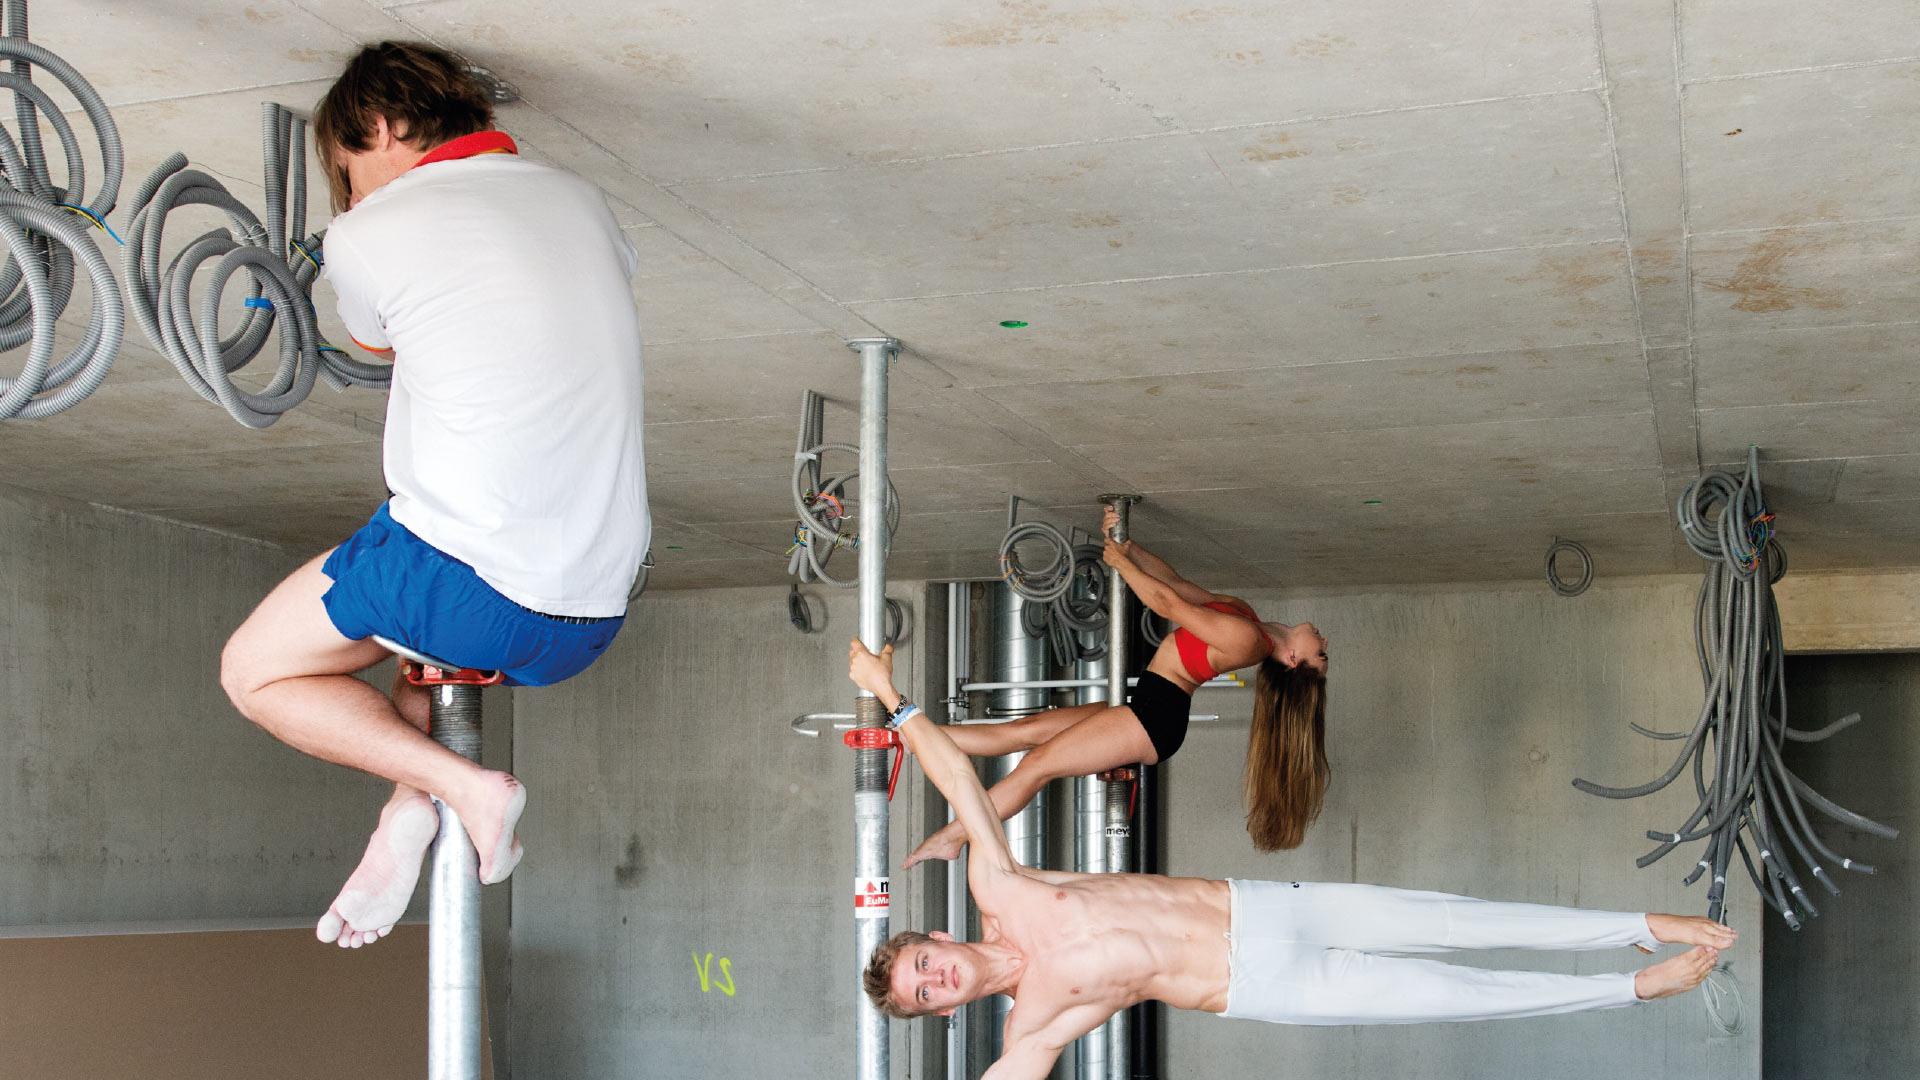 BAI Kunstkampagne - Ideen brauchen Raum - Anna Jernolaewa